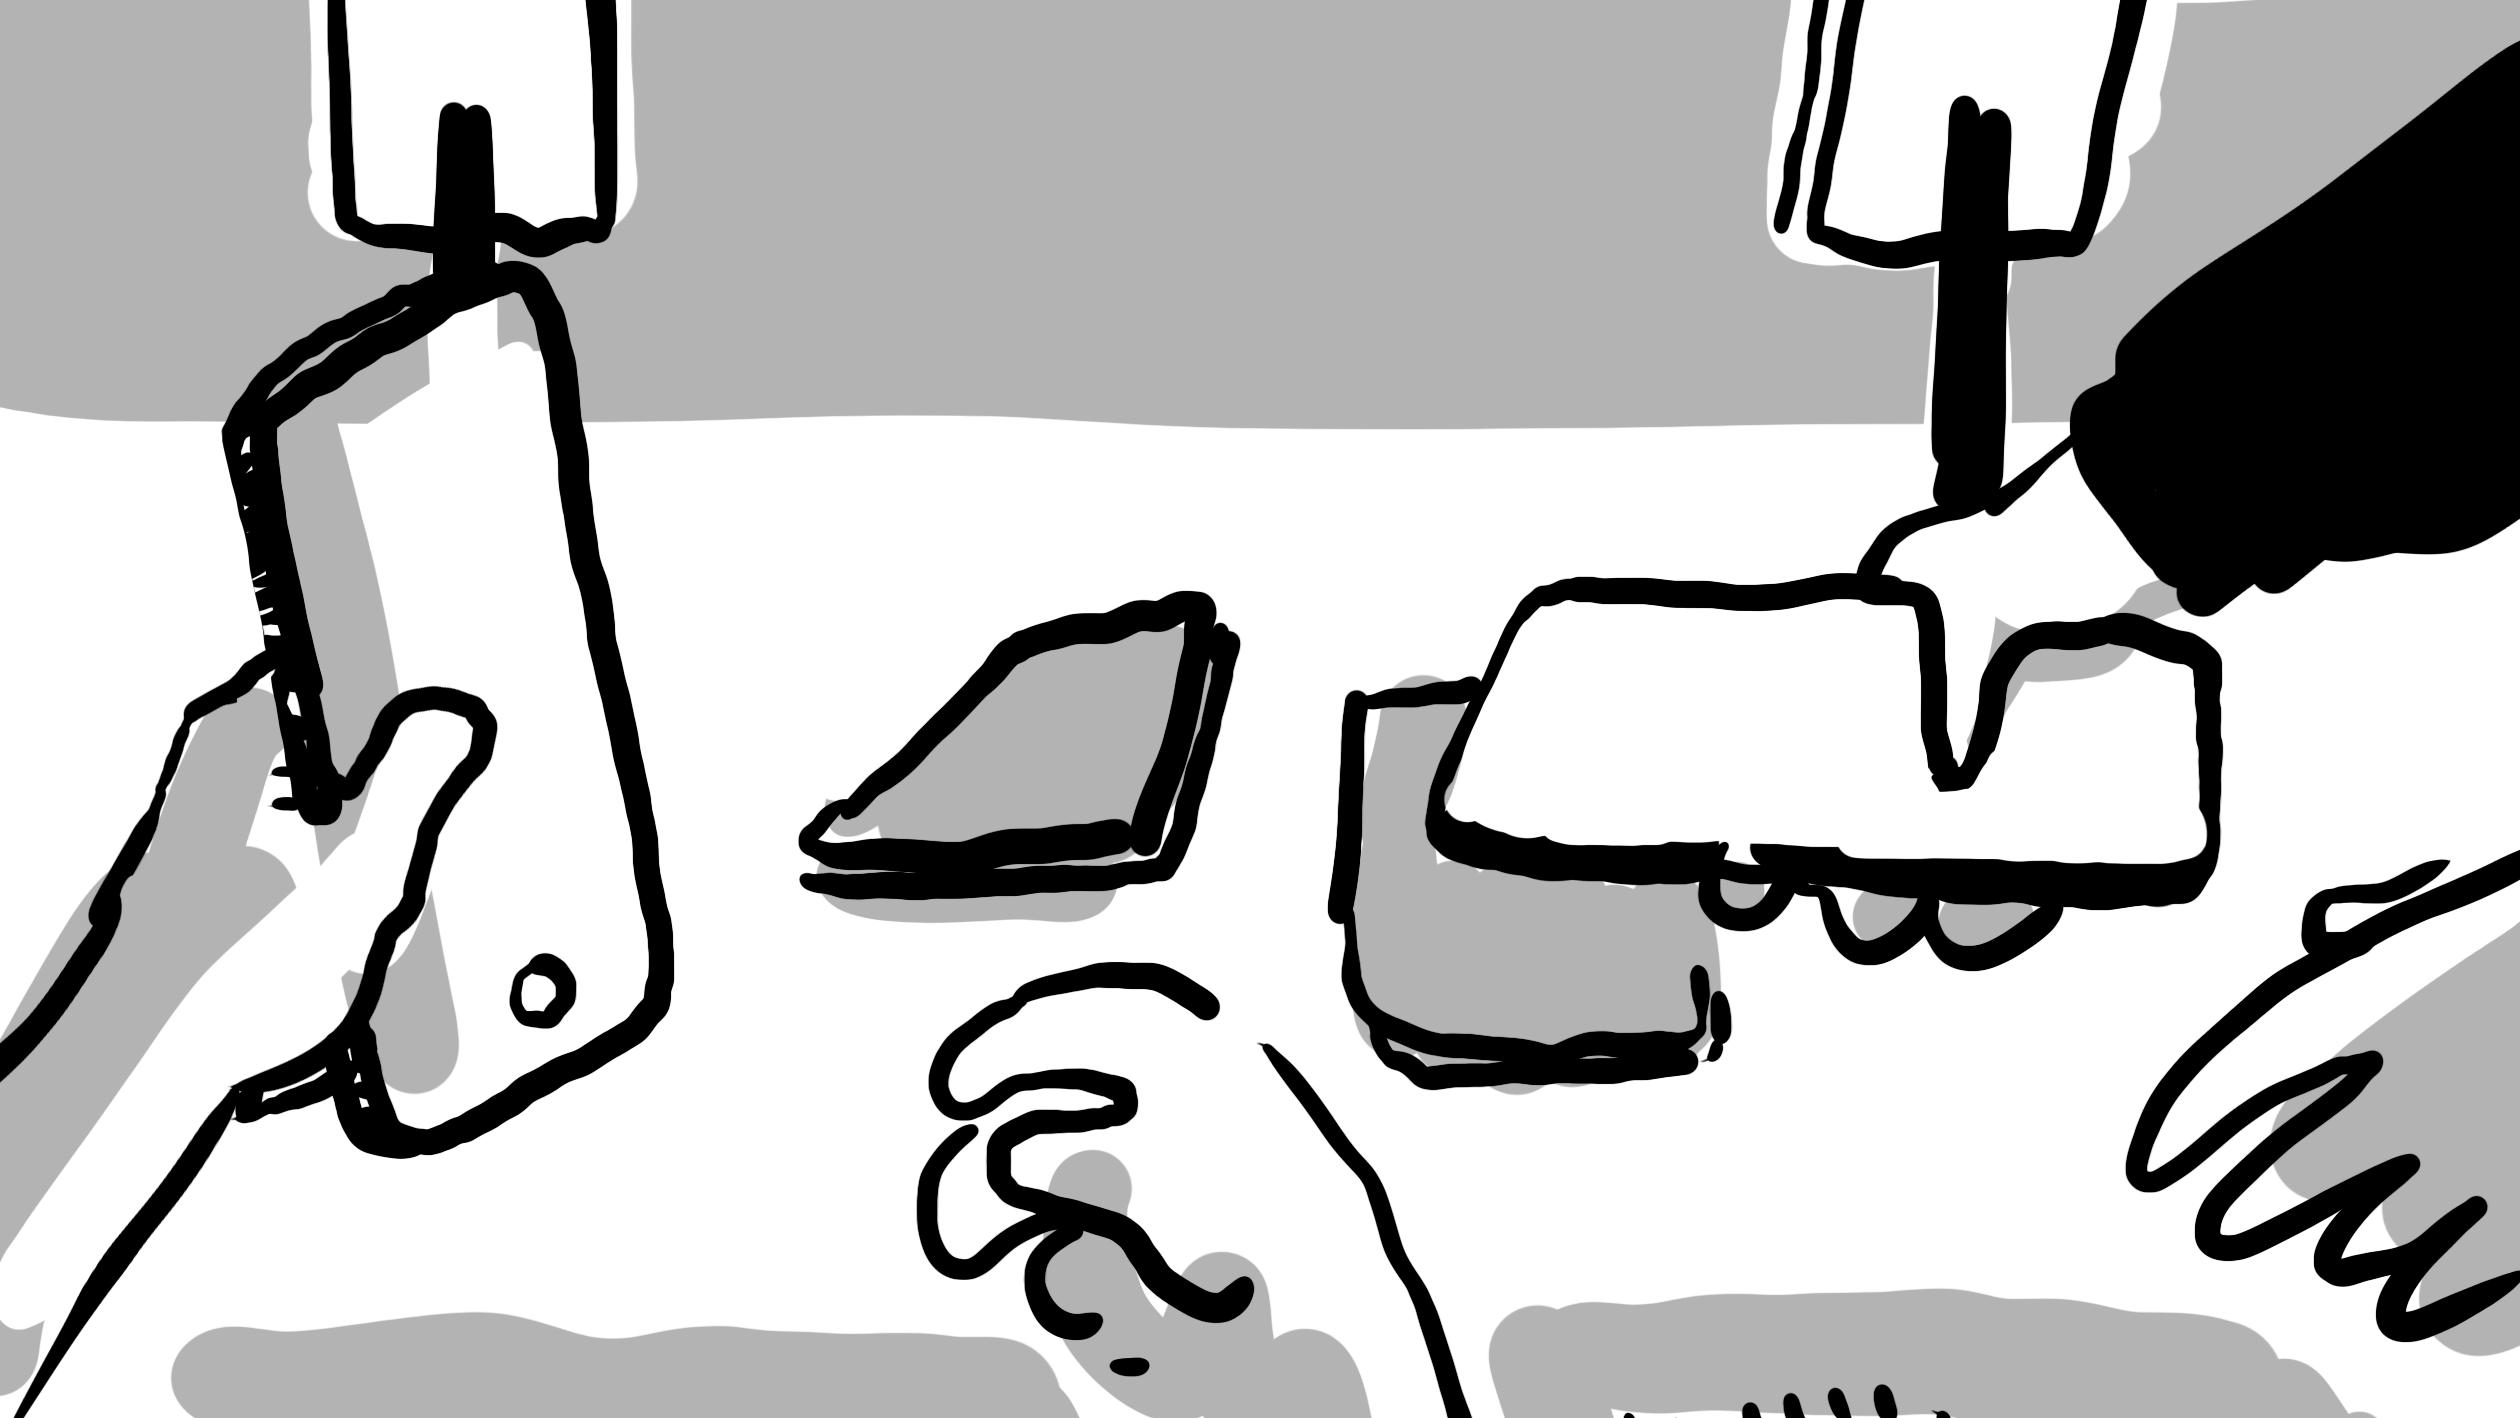 Bild aus Storyboard, Handtisch mit verschiedenen Smartphones